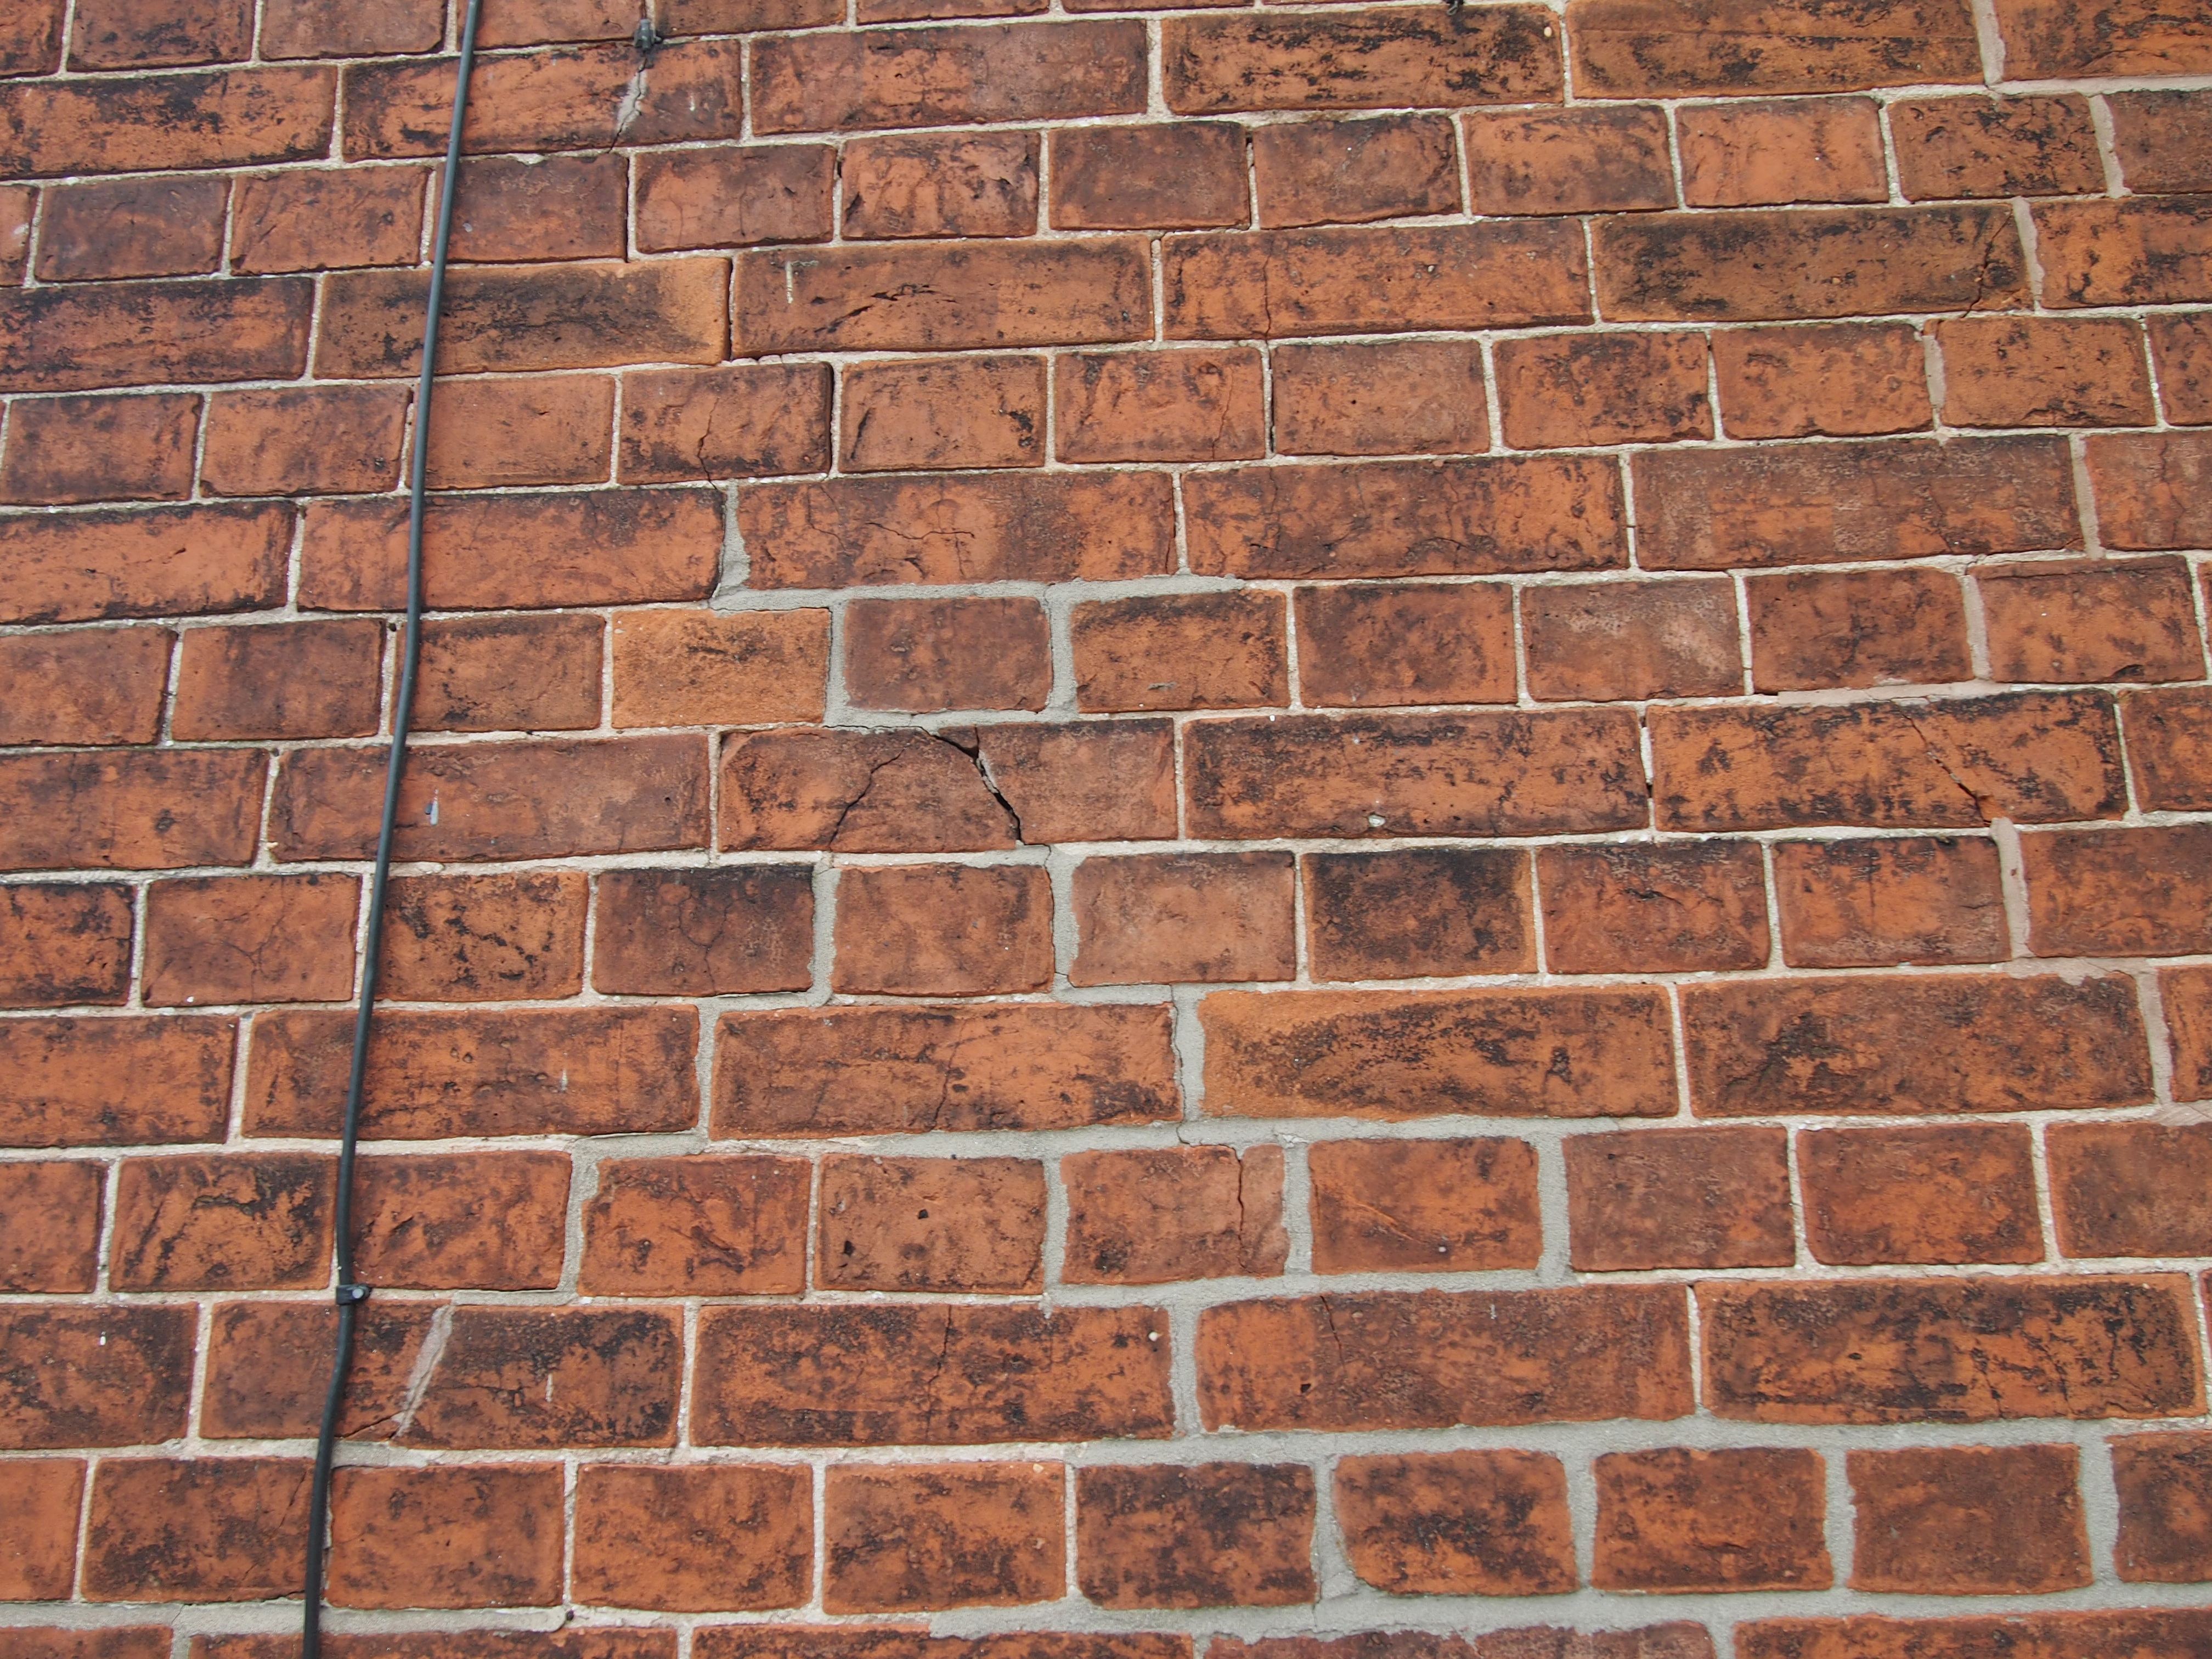 Repointing Heritage Brickwork - Building Defect Analysis